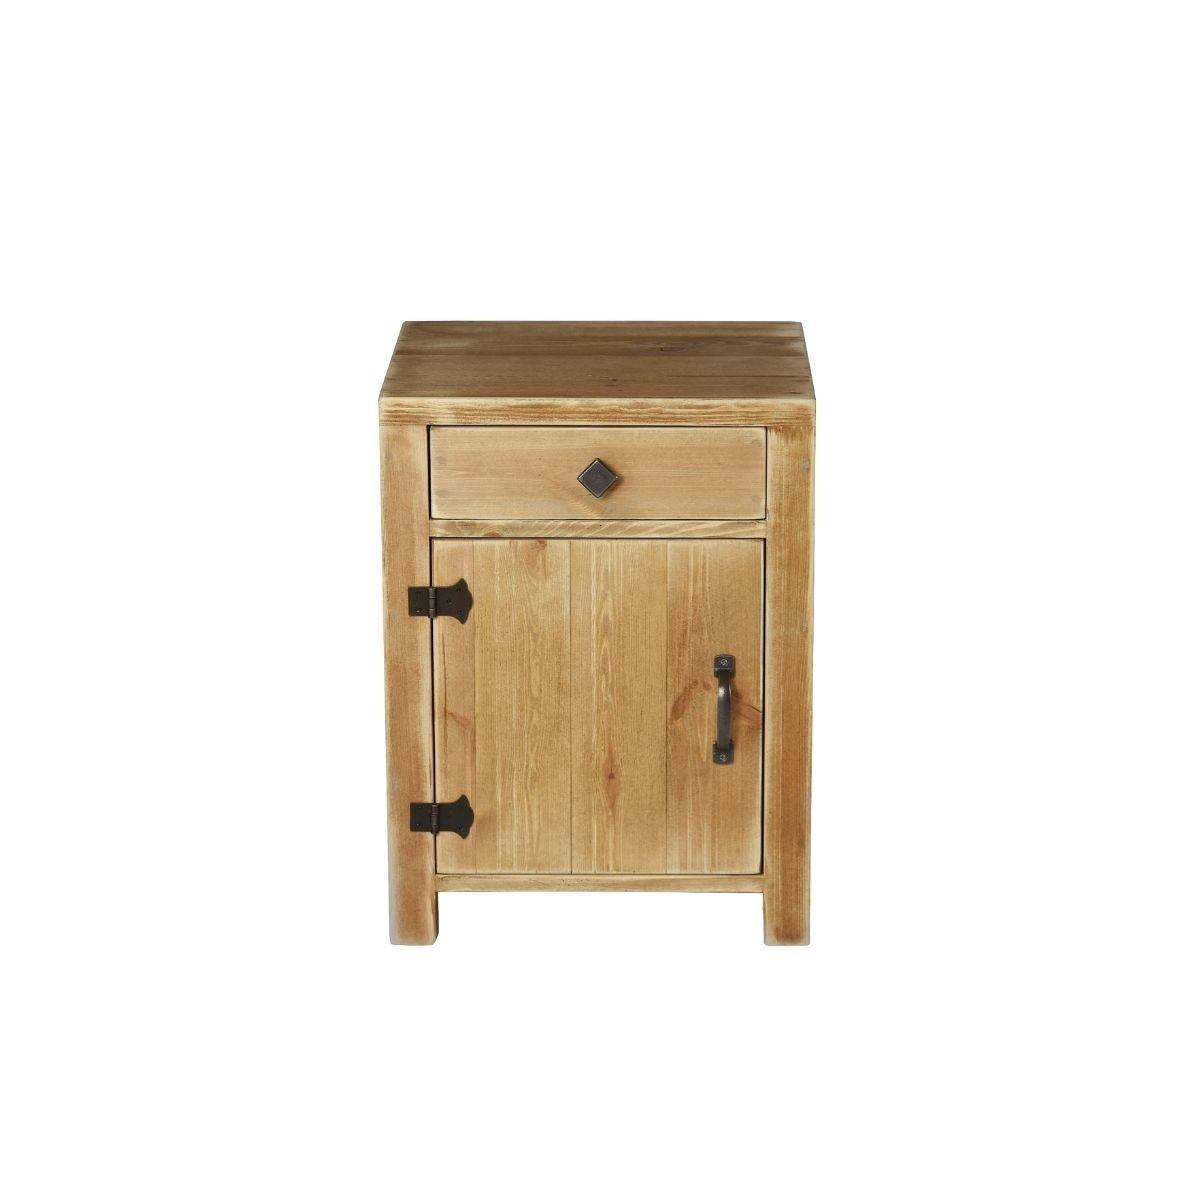 Table de chevet COLETTE 1 tiroir 1 porte bois massif